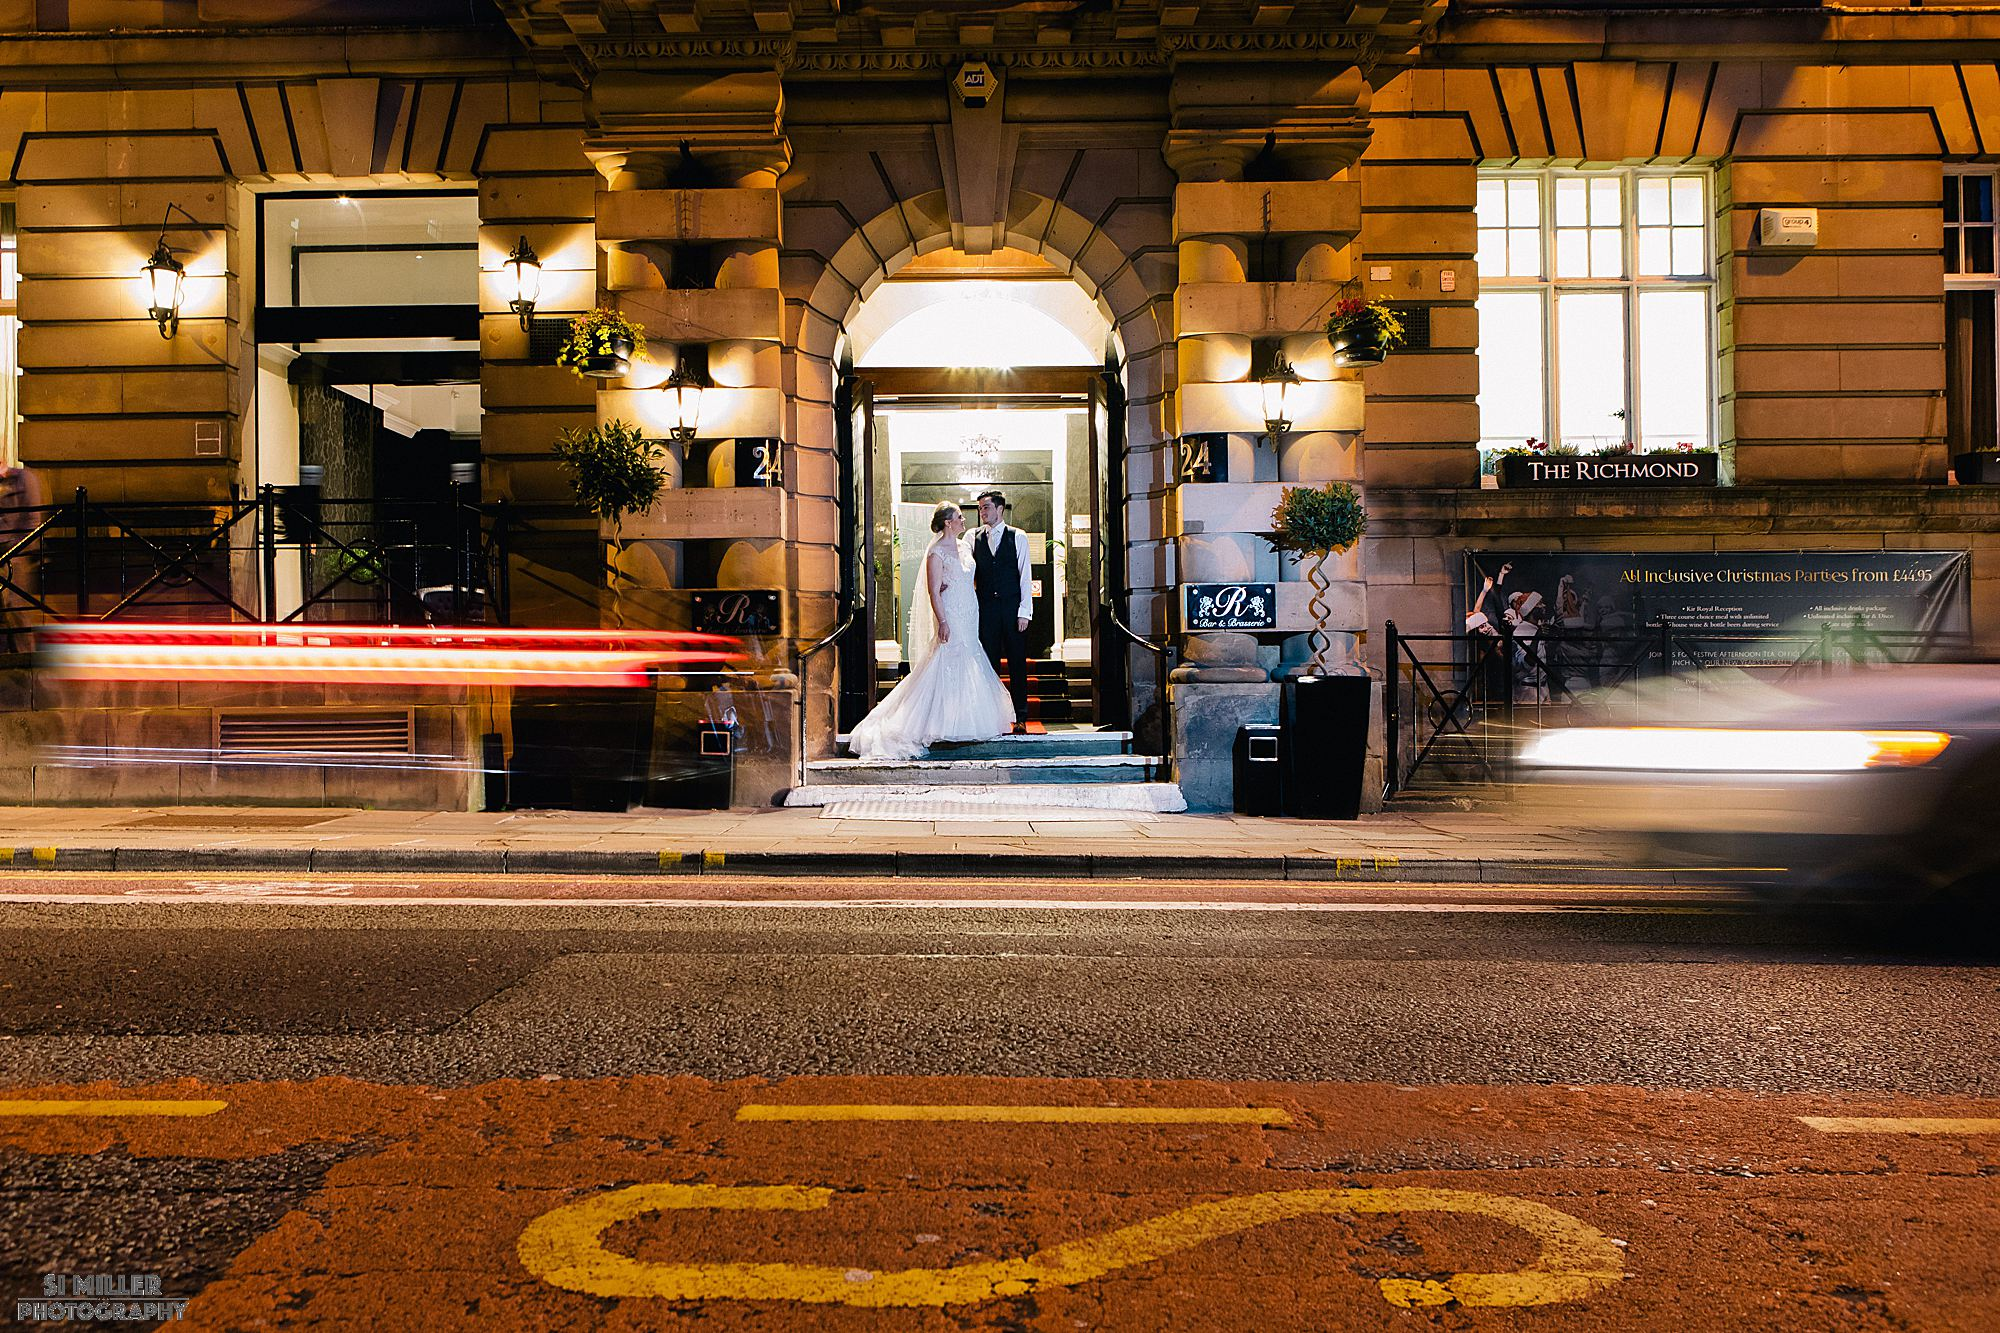 Richmond Hotel wedding photographer Liverpool